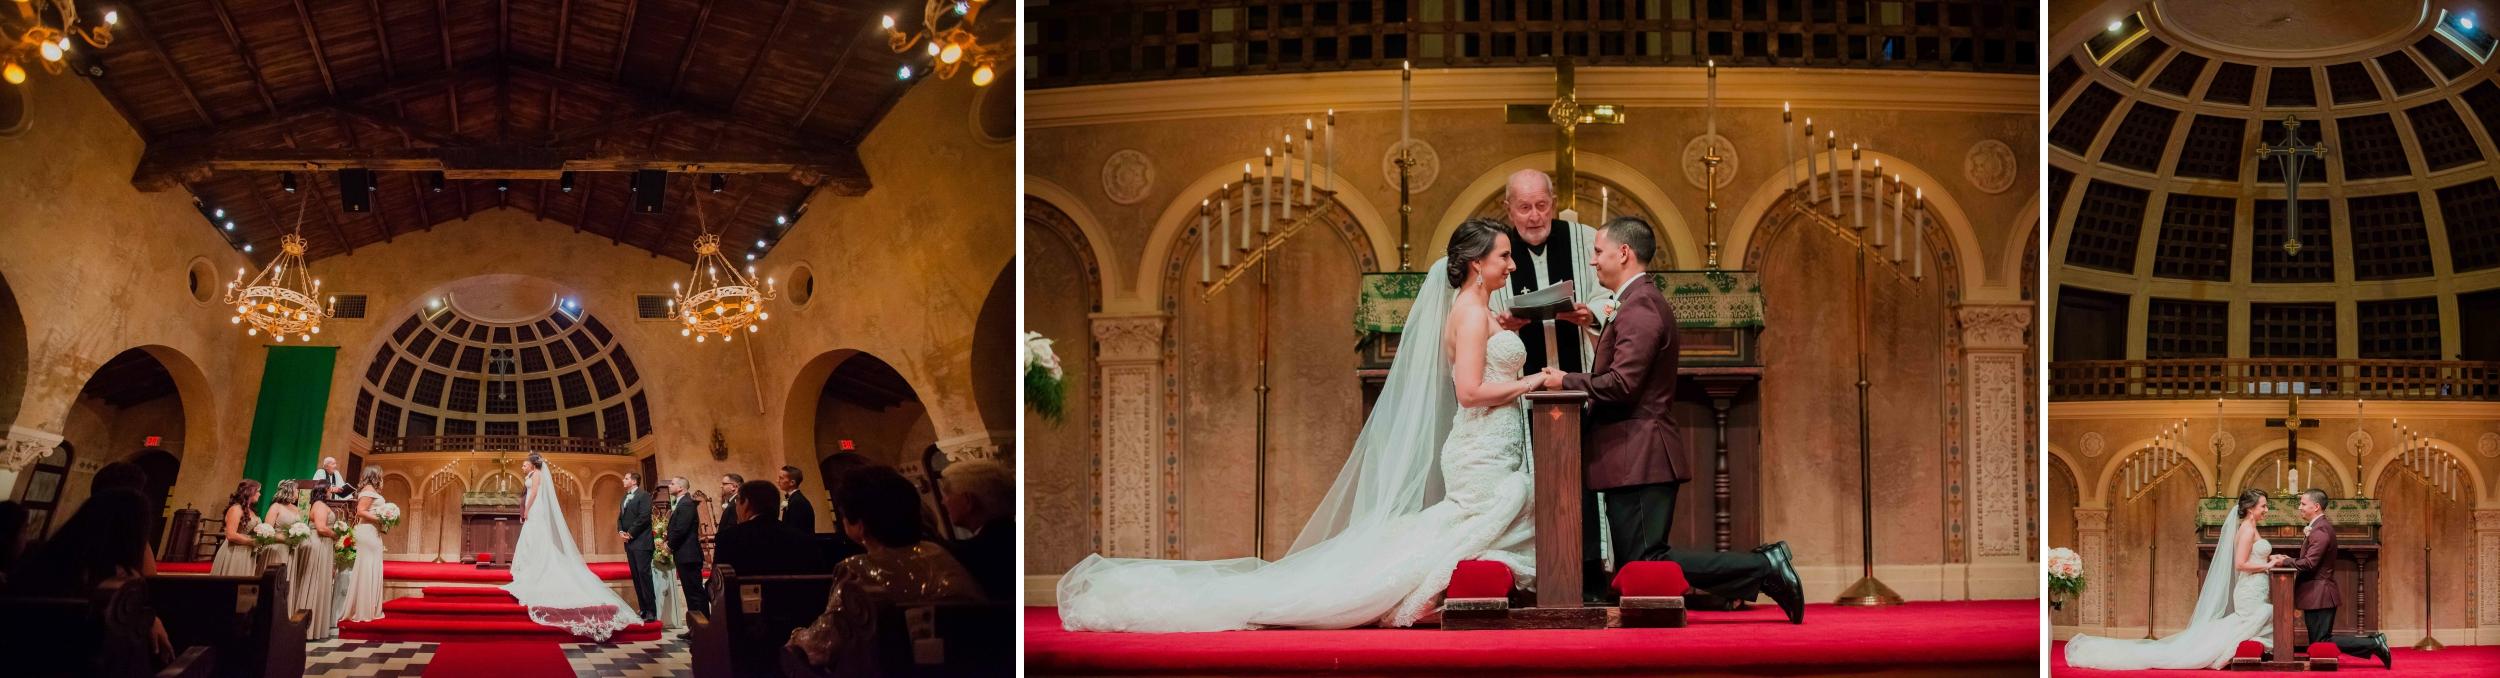 Wedding - Coco Plum - Coral Gables Congregational - Santy Martinez Photography 21.jpg